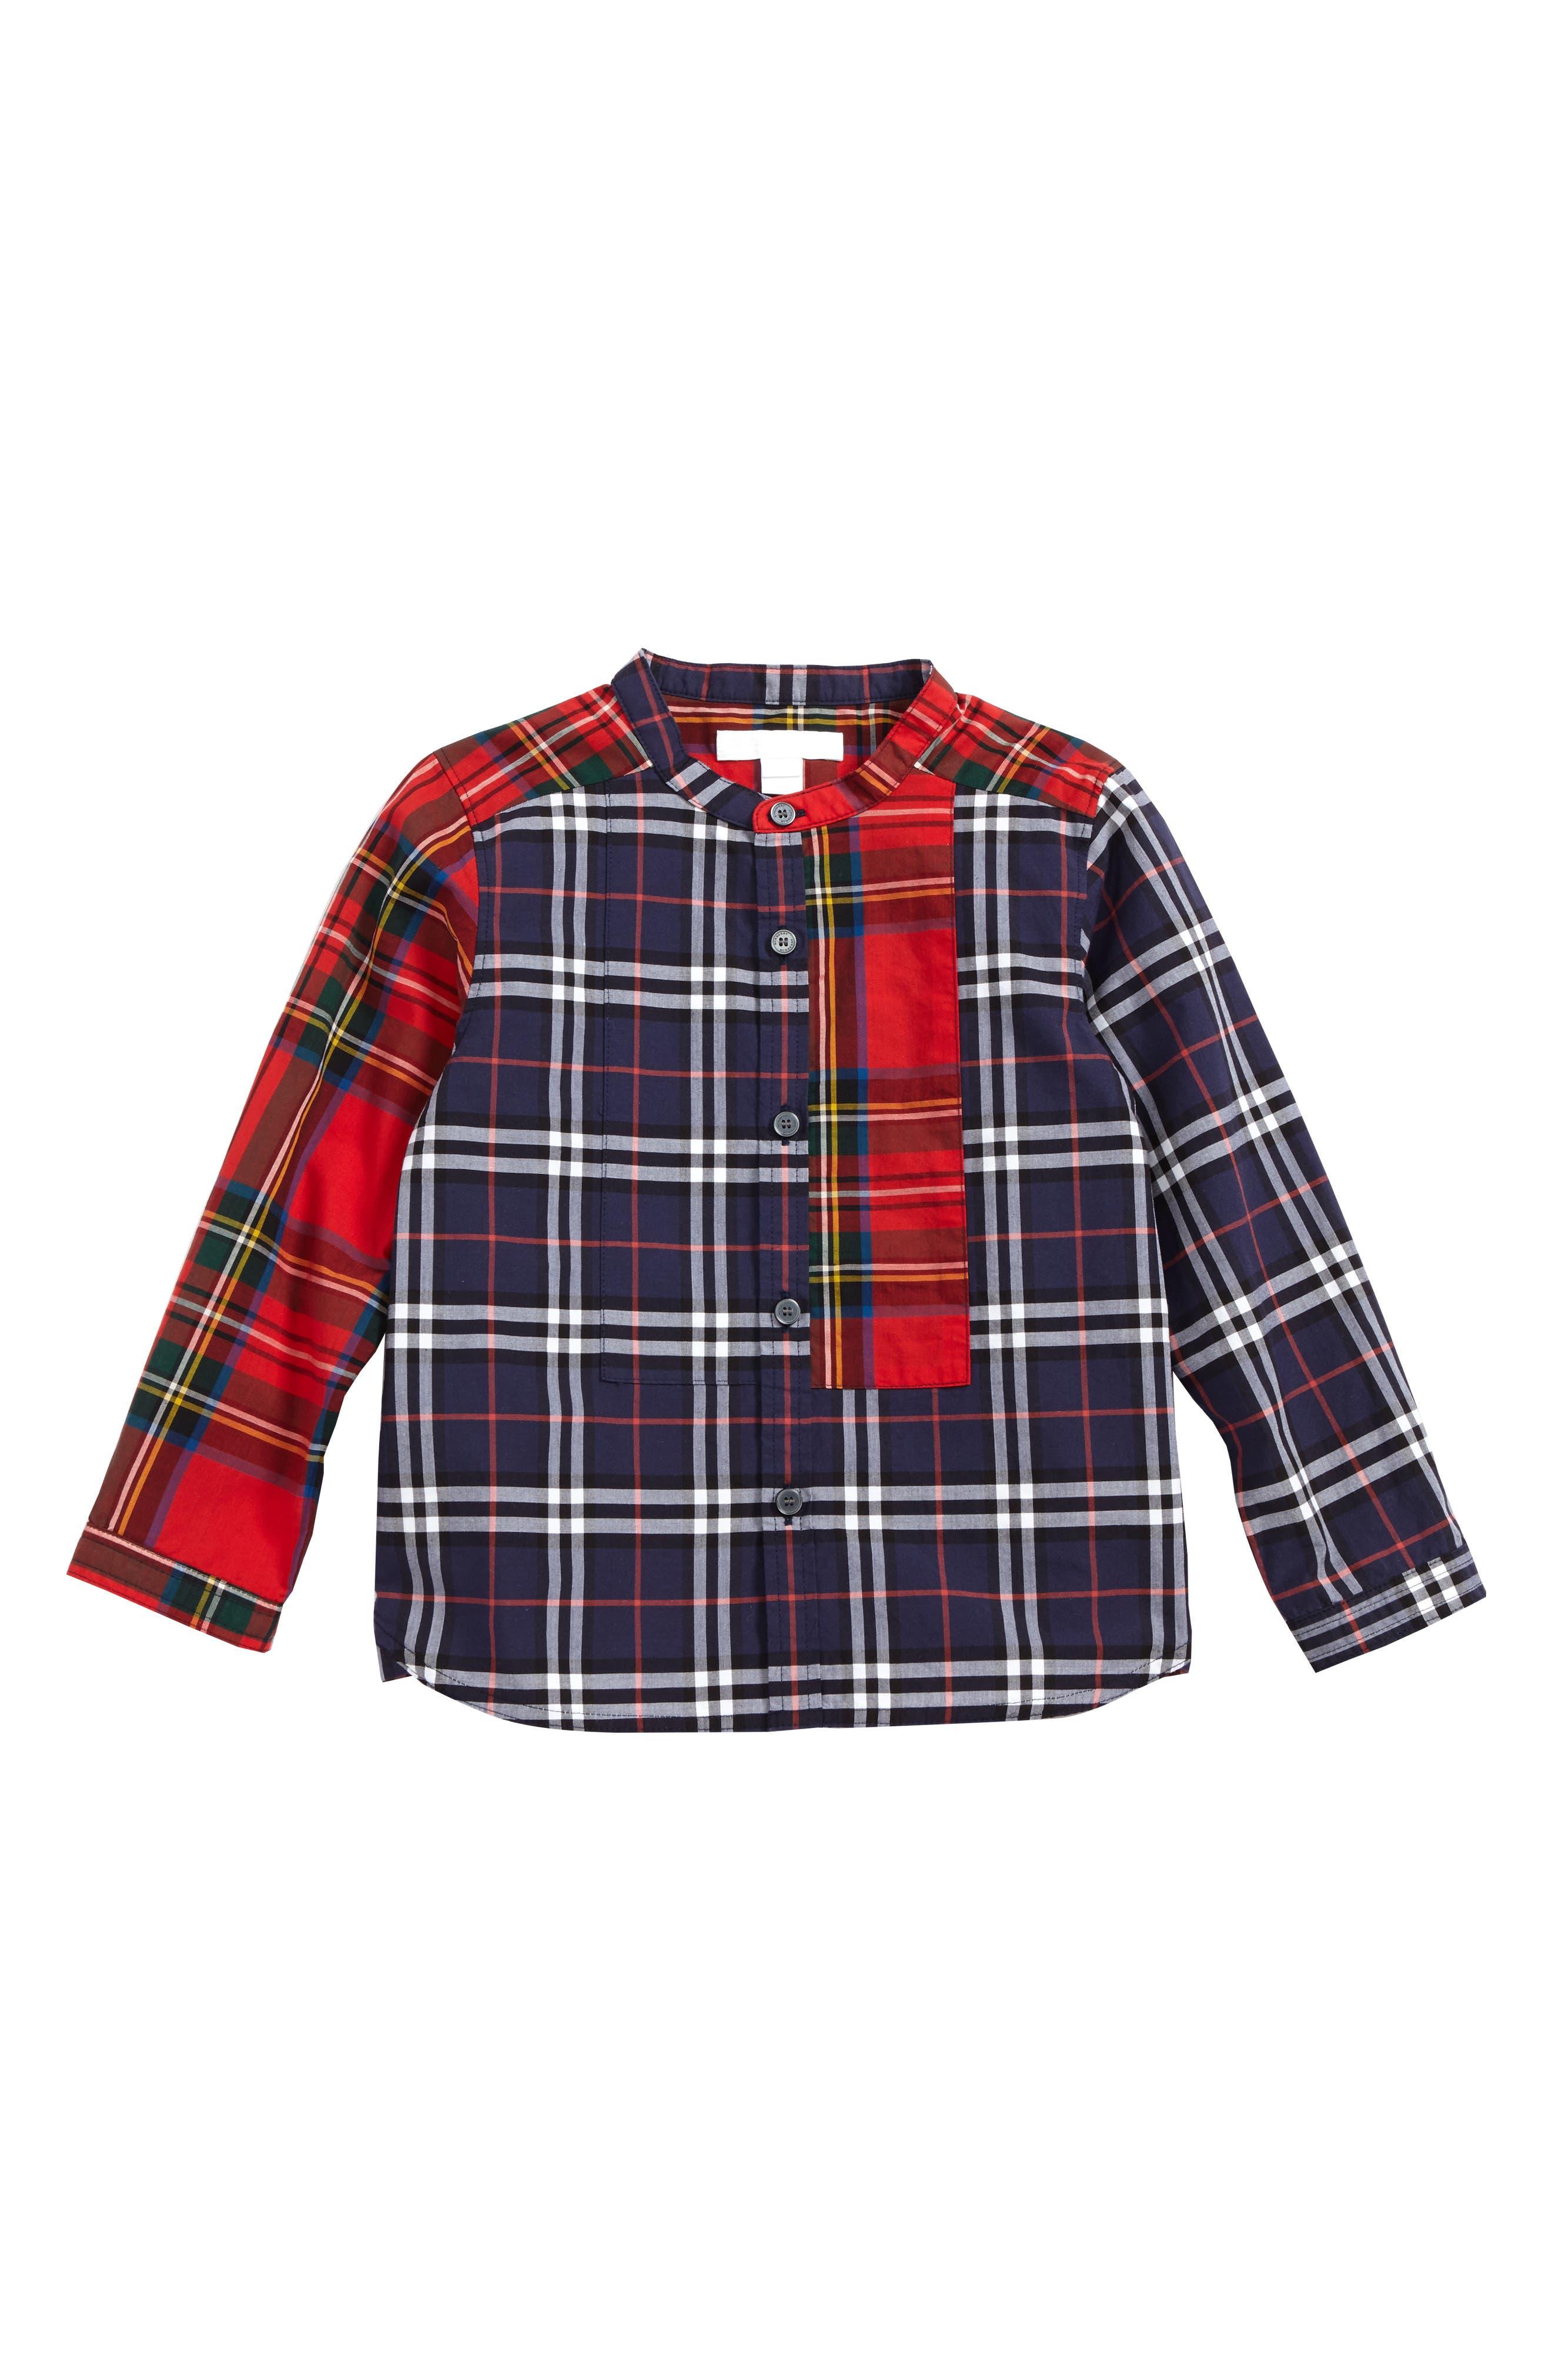 Alternate Image 1 Selected - Burberry Argus Check Print Woven Shirt (Toddler Boys, Little Boys & Big Boys)